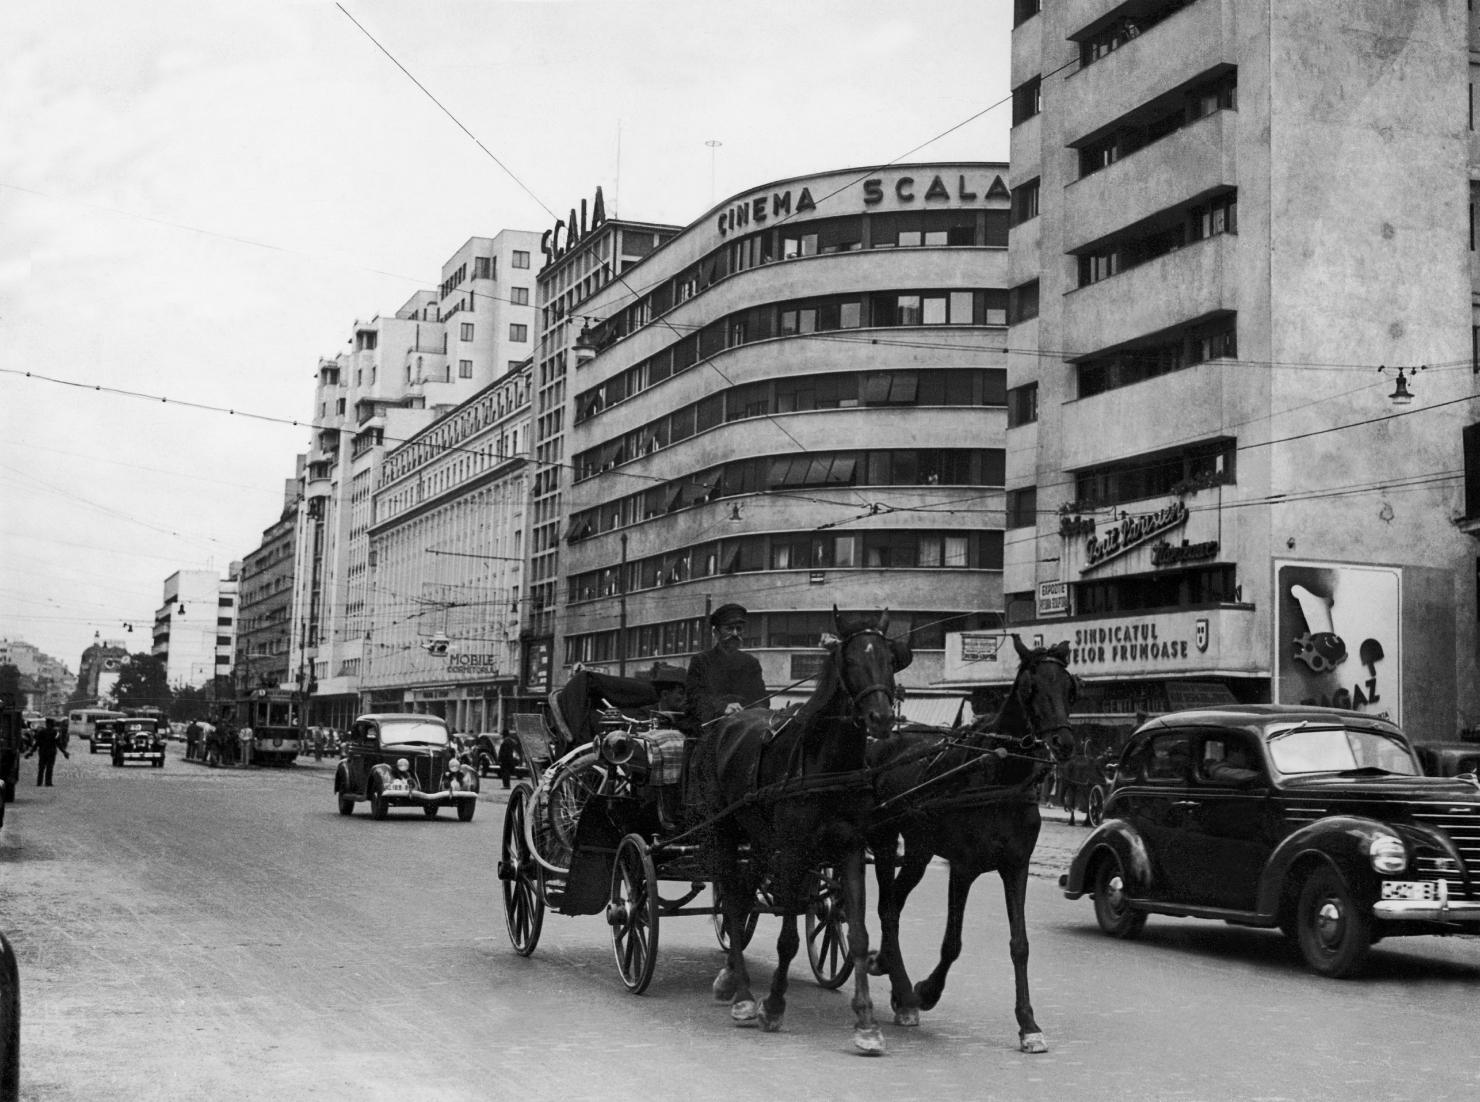 Cinema Scala, în anii '40